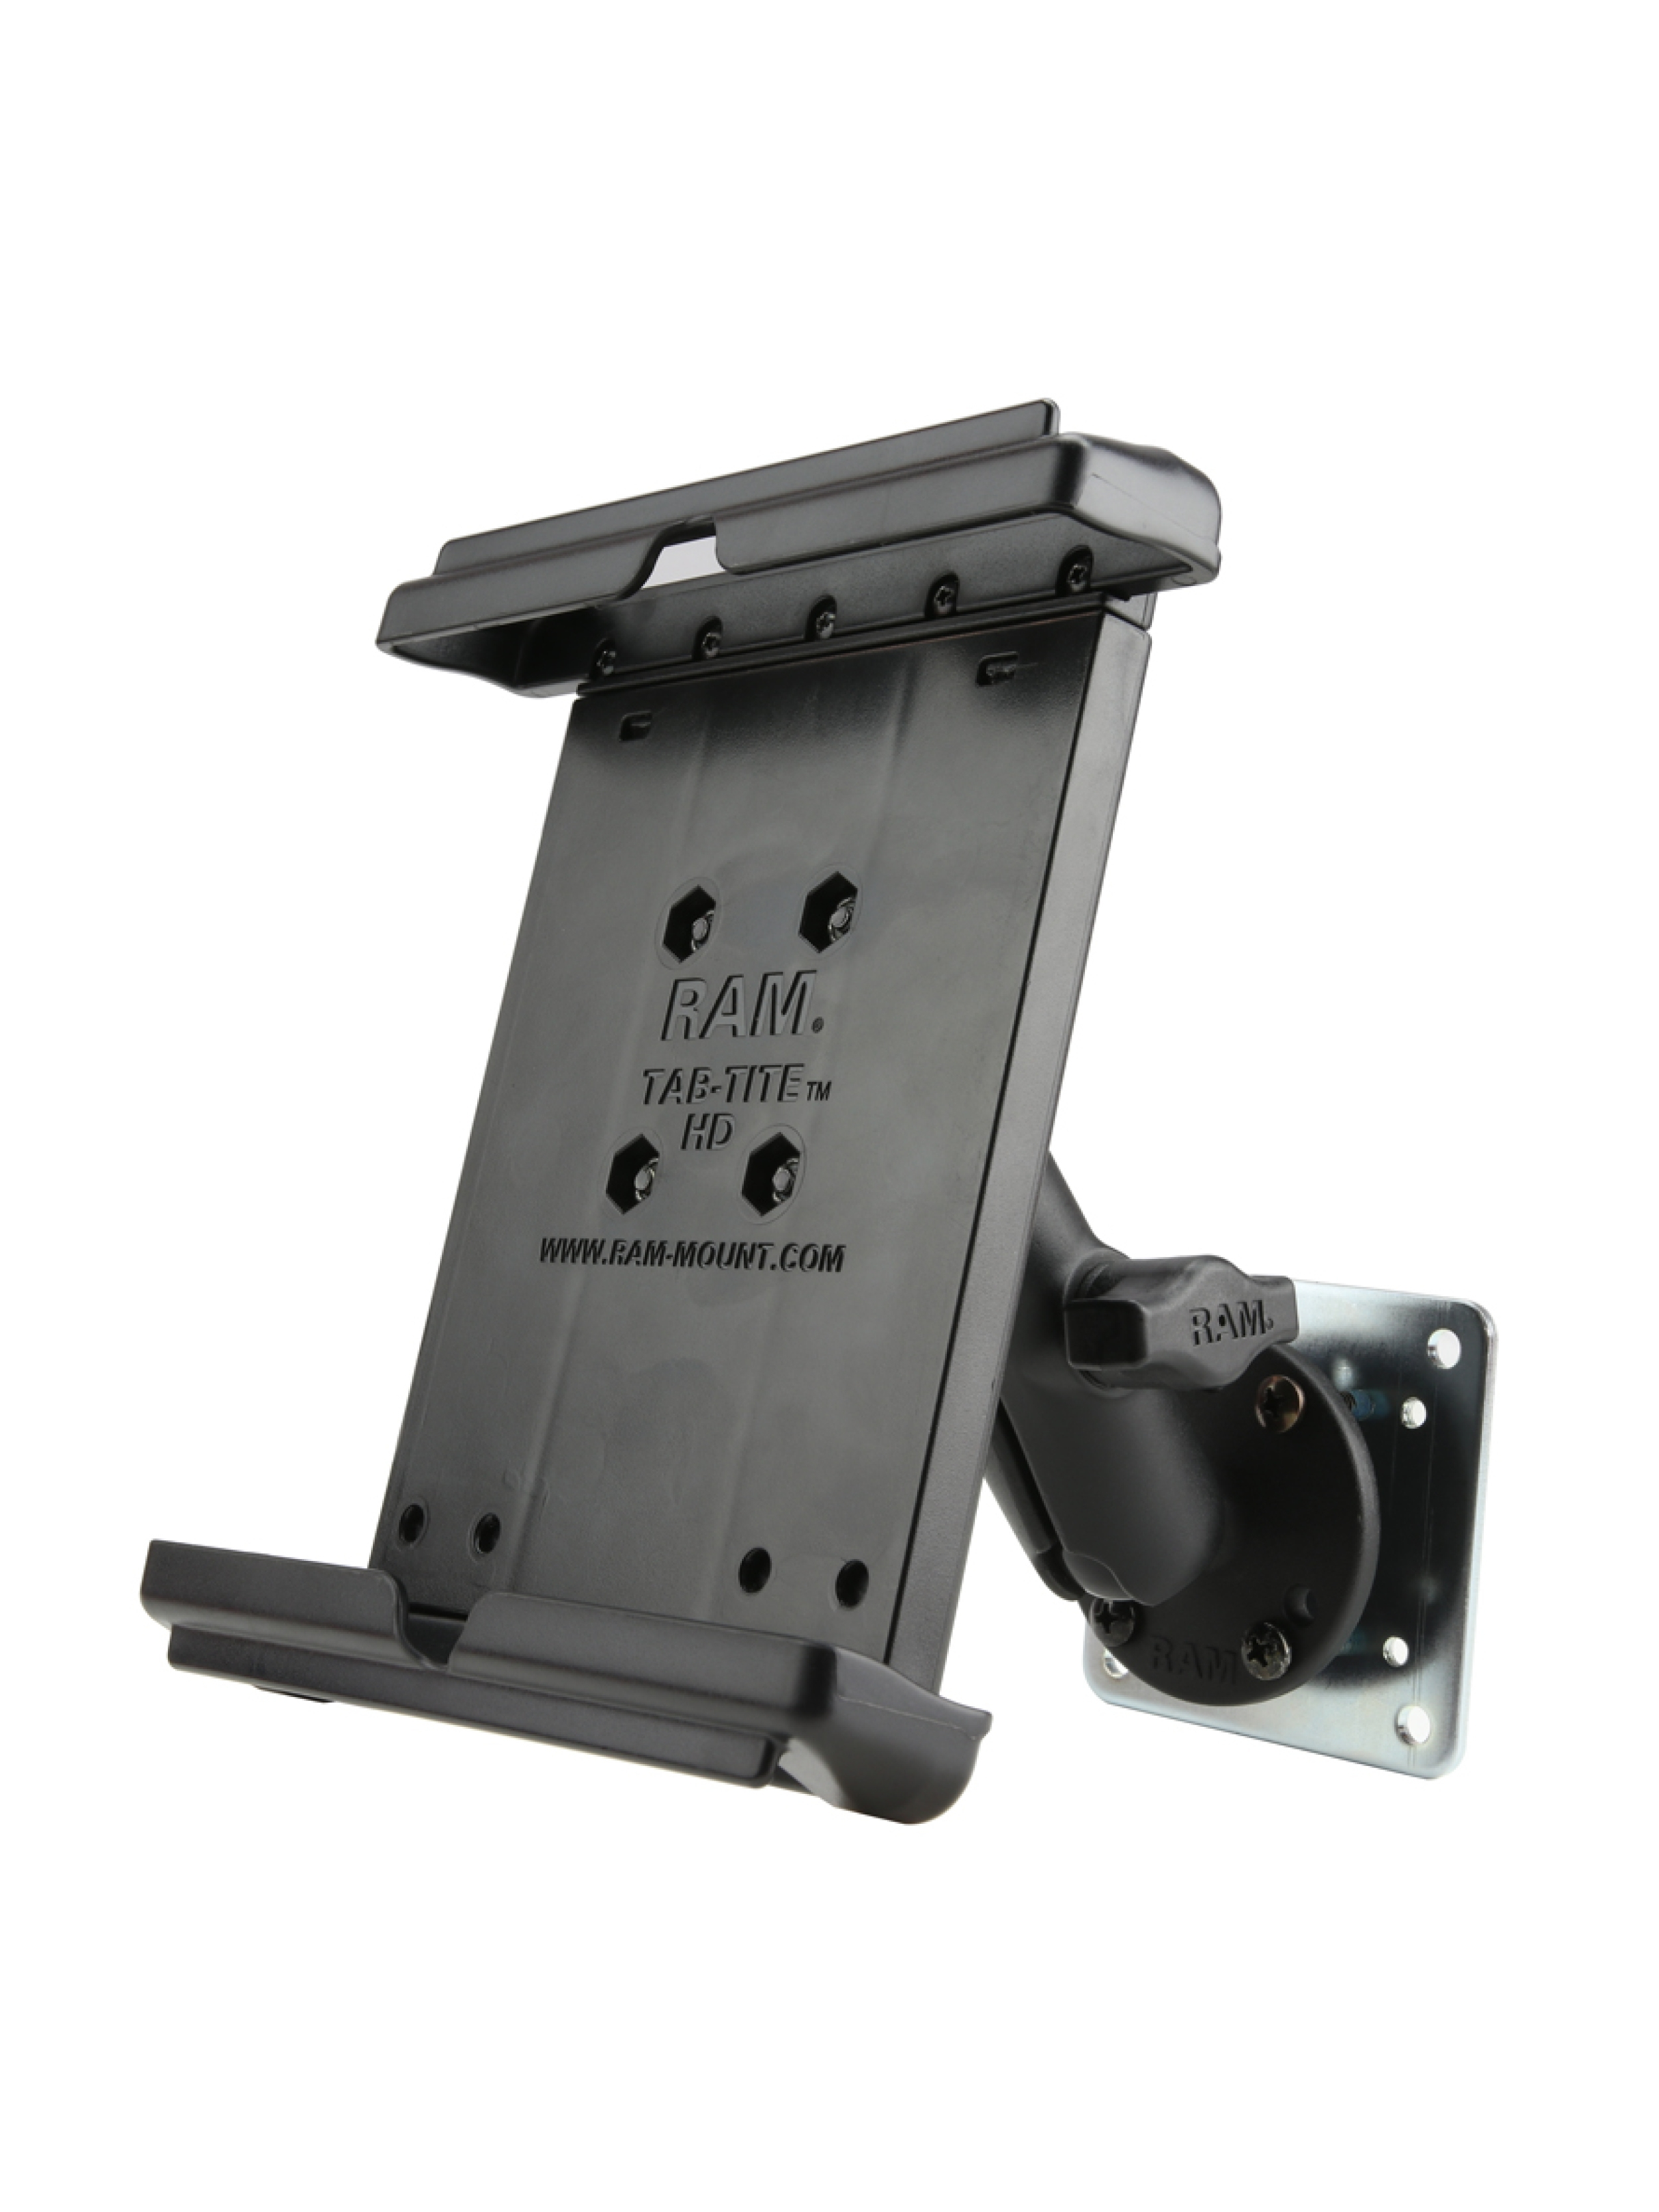 RAM Mounts Armaturenbrett-Halterung für 8 Zoll Tablets - B-Kugel (1 Zoll), mit Gegenplatte